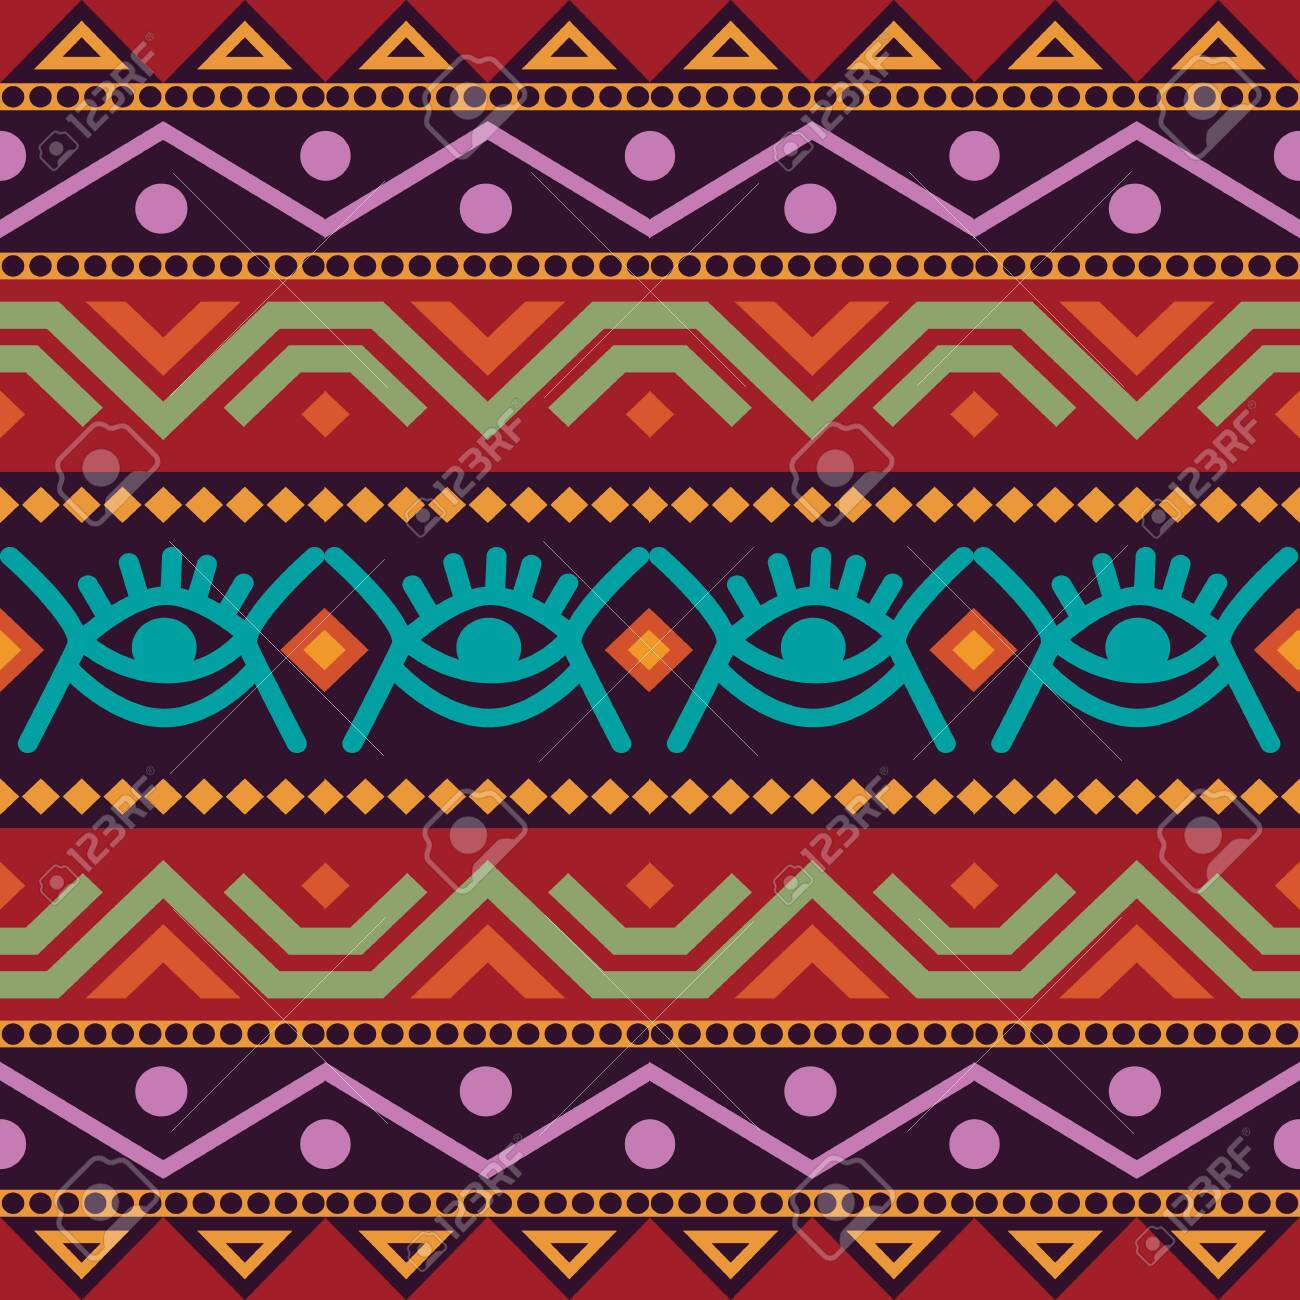 African seamless with adinkra symbols. Antique pattern design. - 145203386